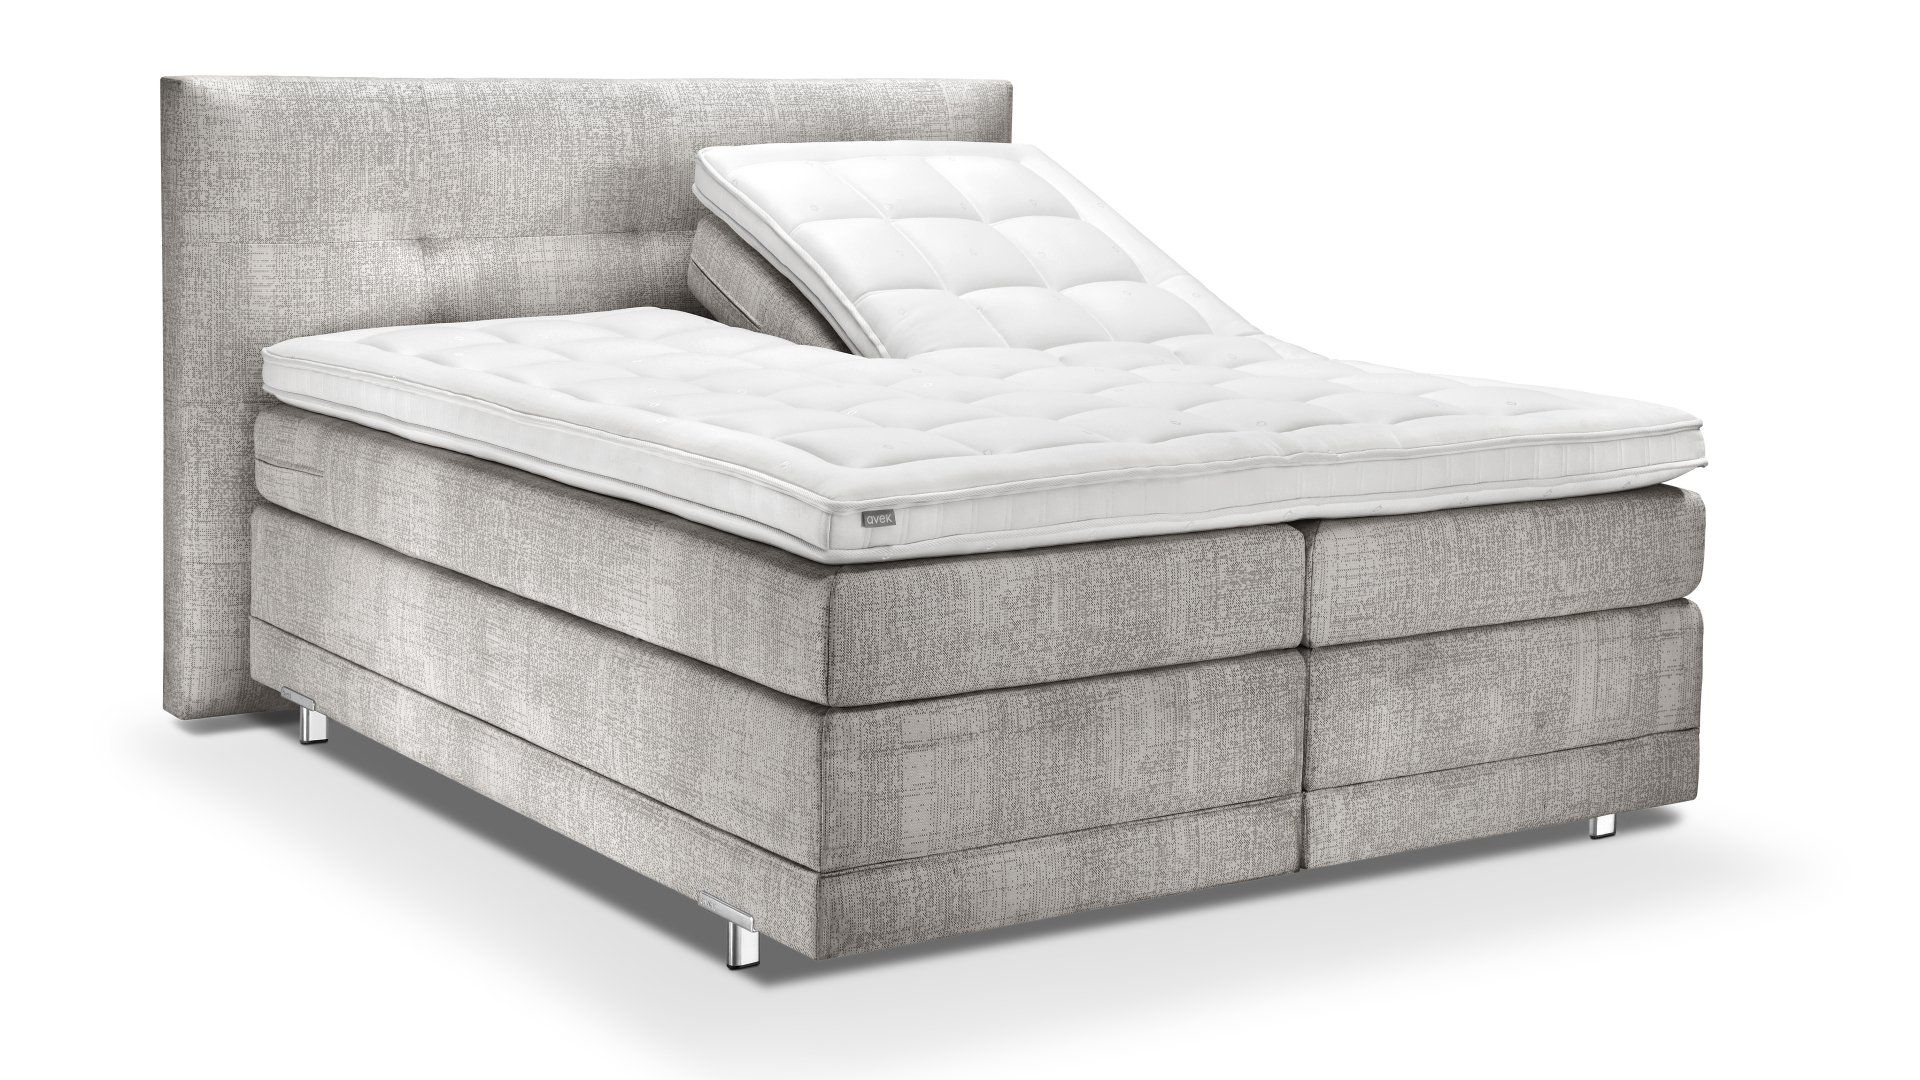 avek boxspring noflik kwaliteit voor jaren slaaphof. Black Bedroom Furniture Sets. Home Design Ideas